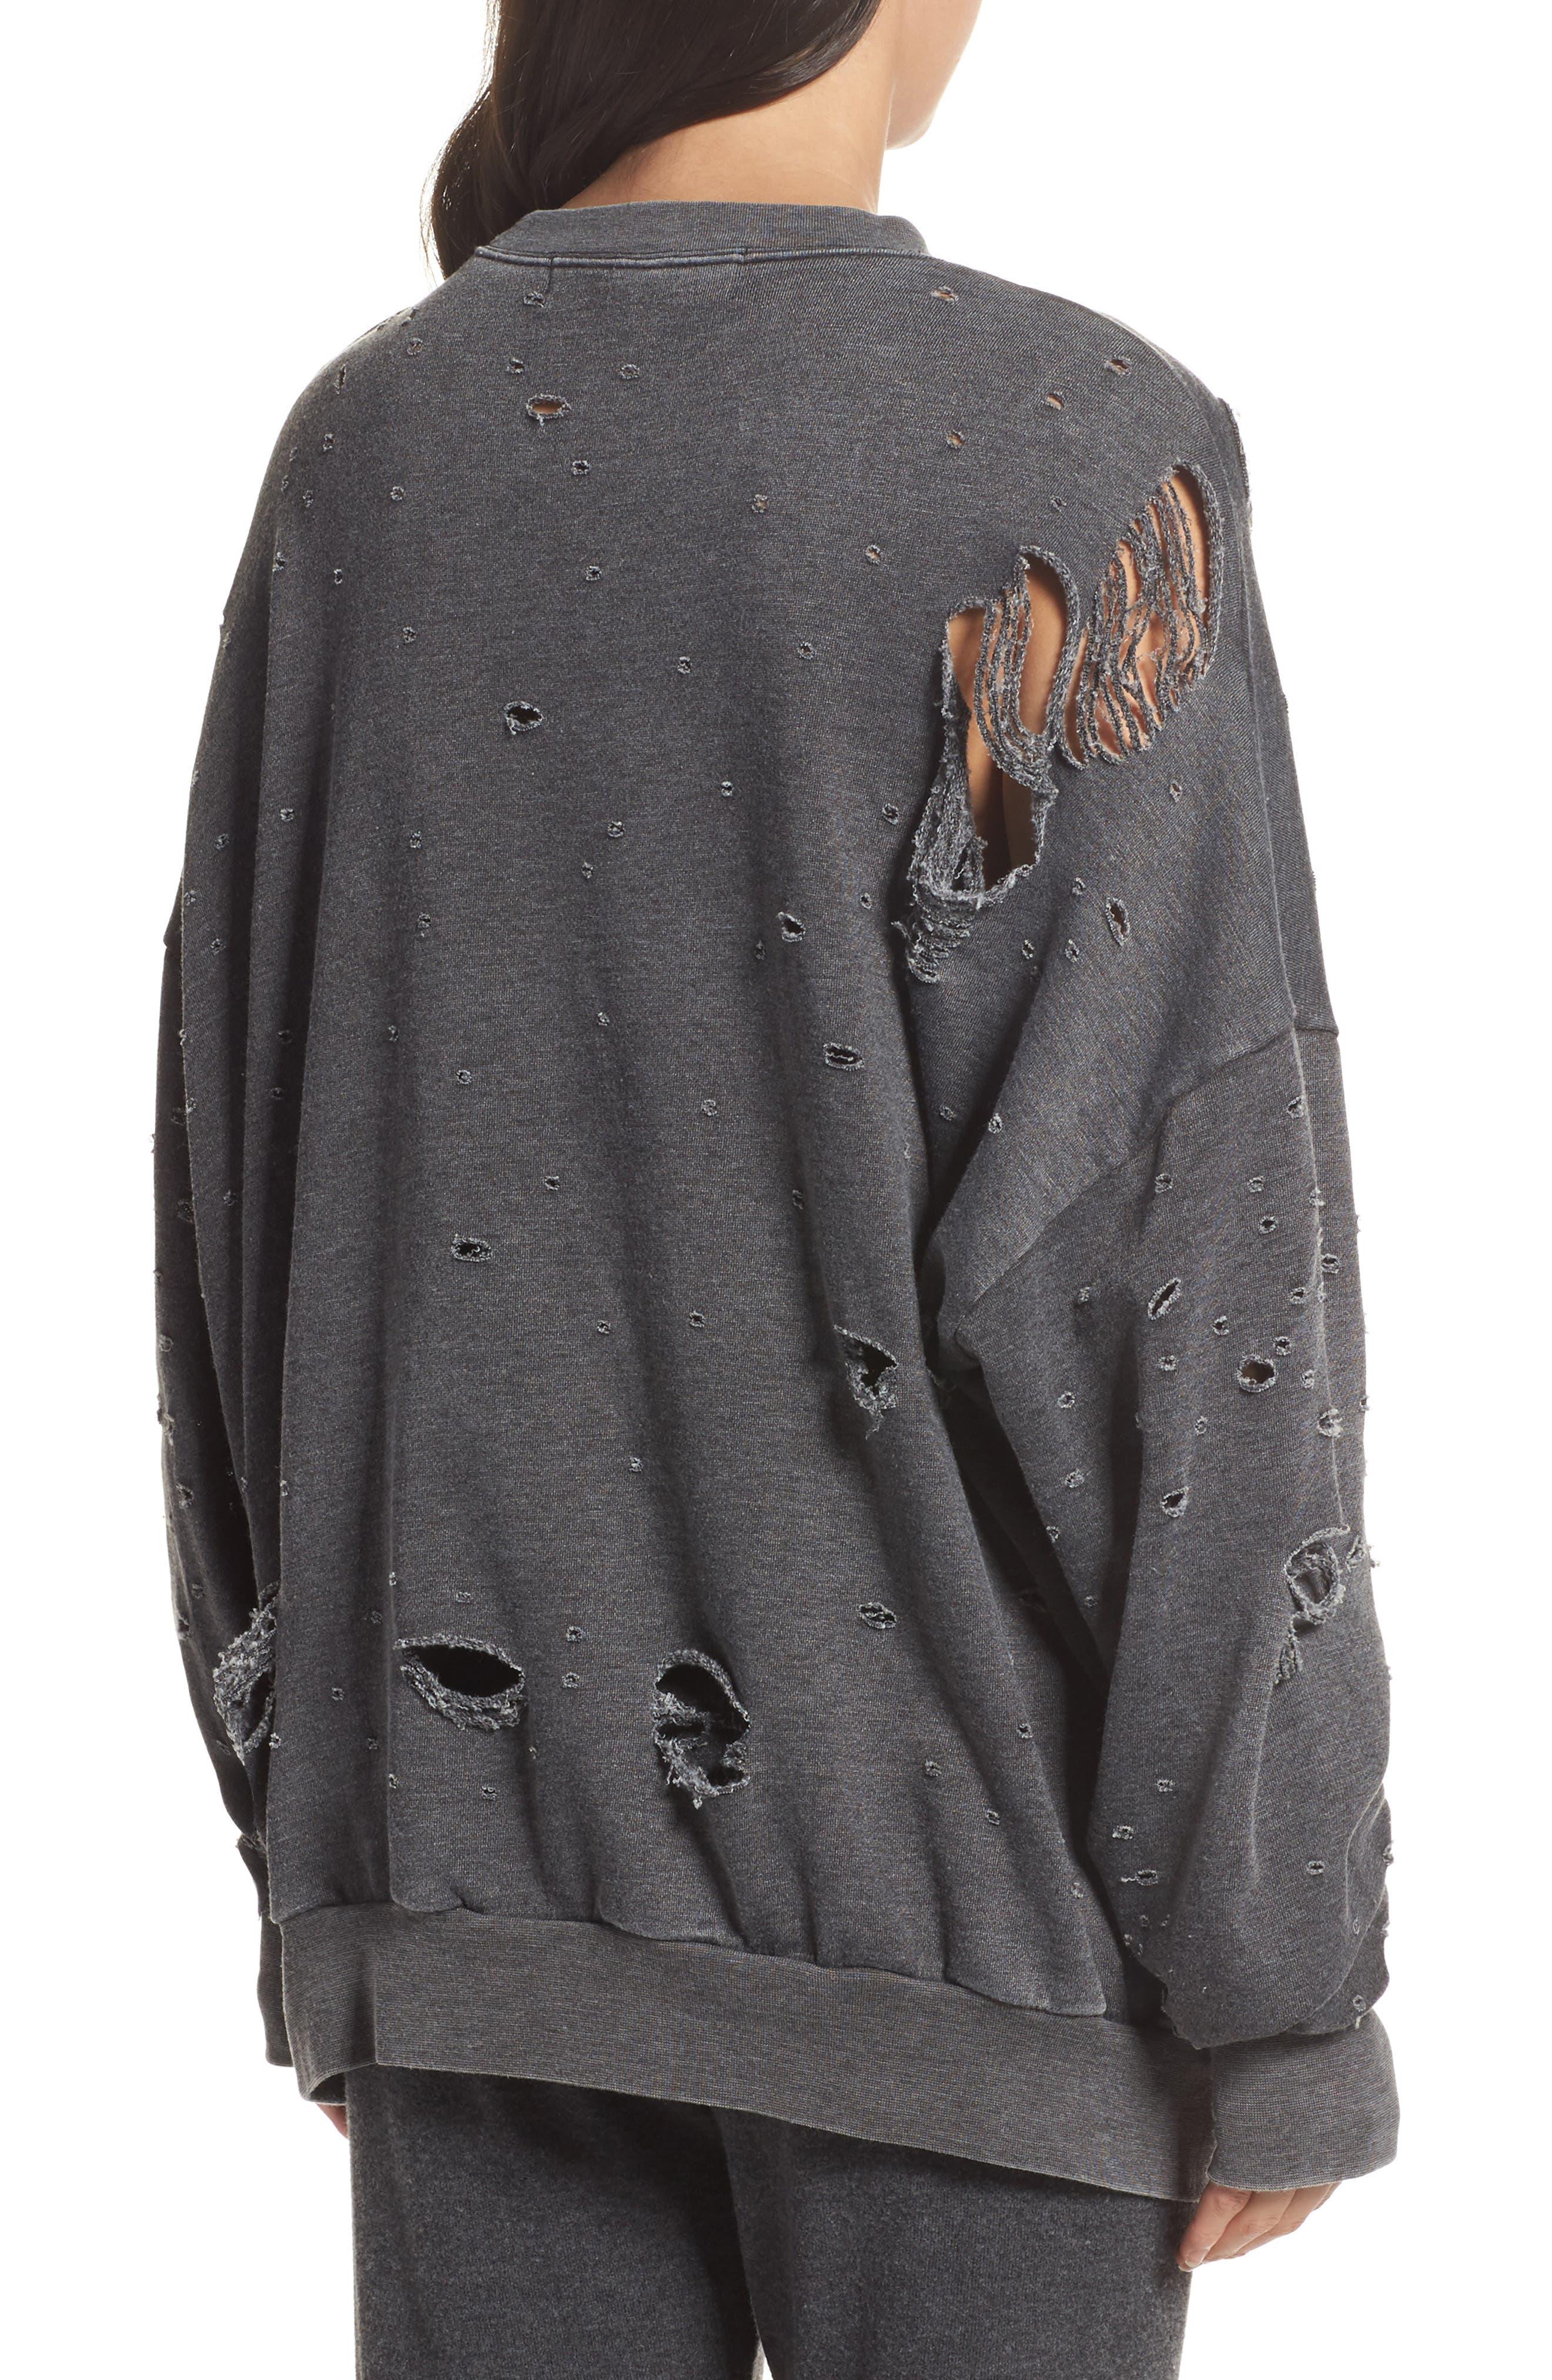 Thrasher Sweatshirt,                             Alternate thumbnail 2, color,                             020